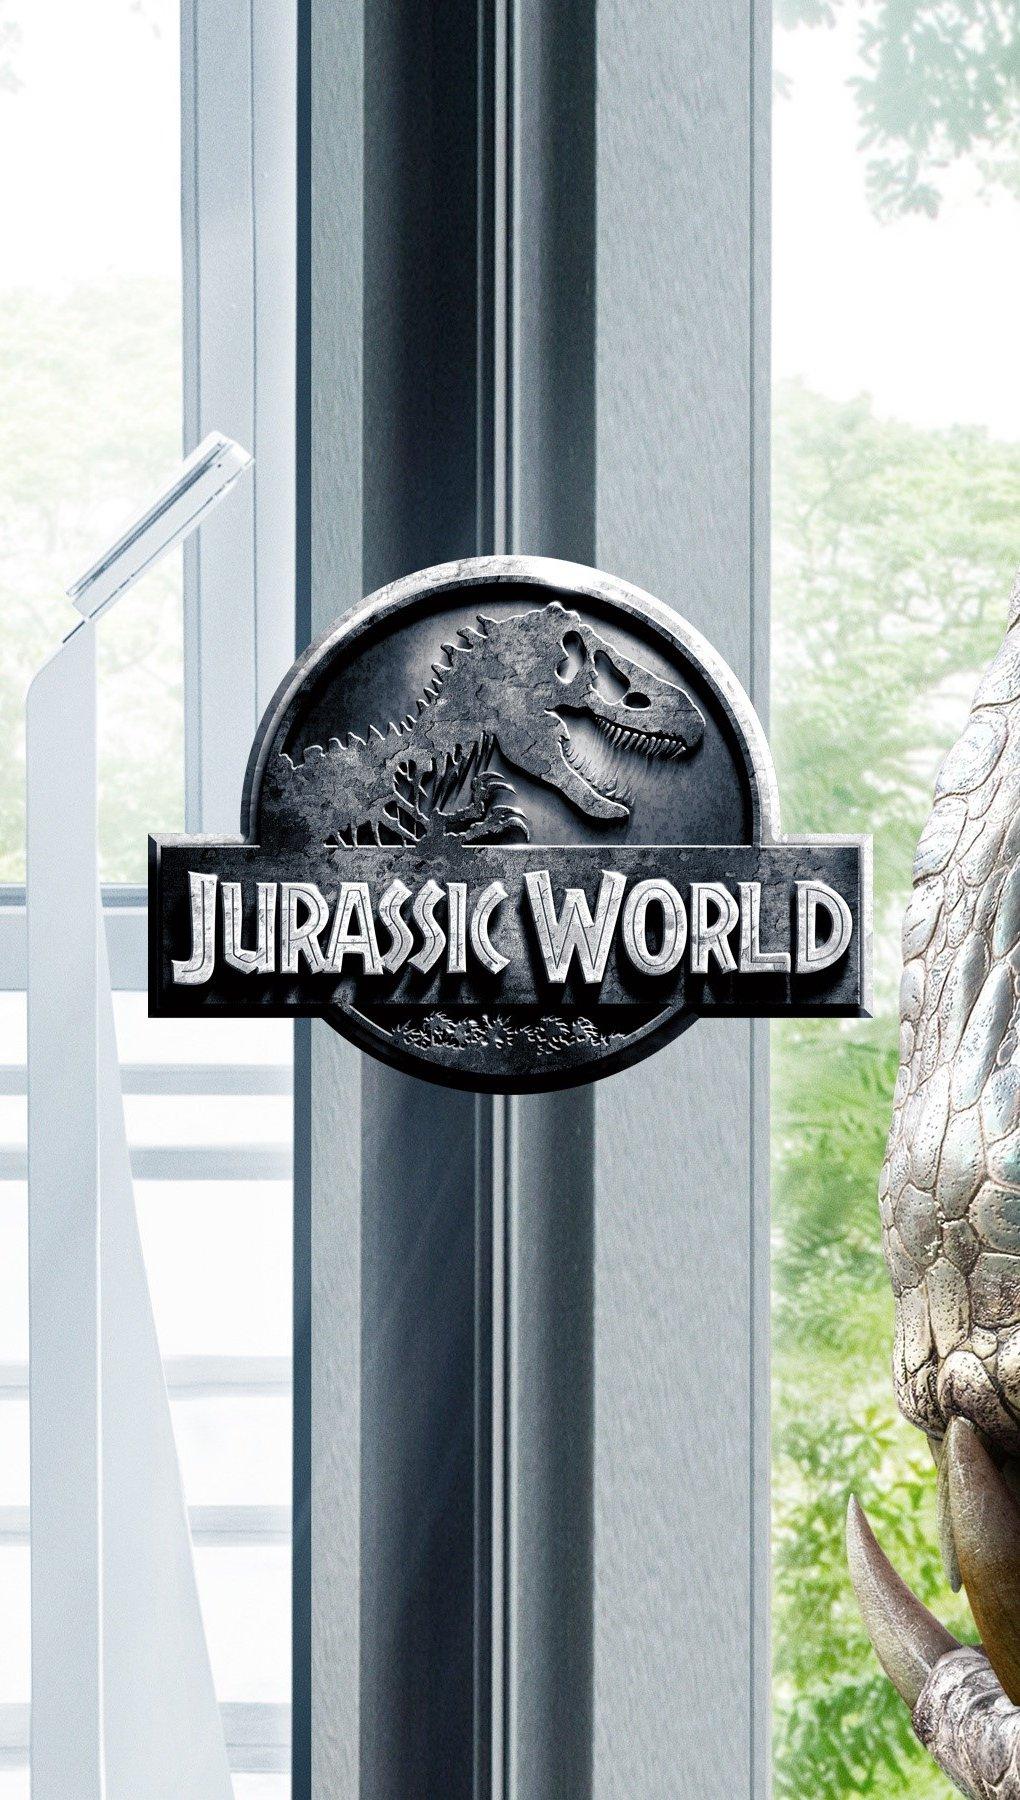 Fondos de pantalla Bryce Dallas Howard En Jurassic World Vertical